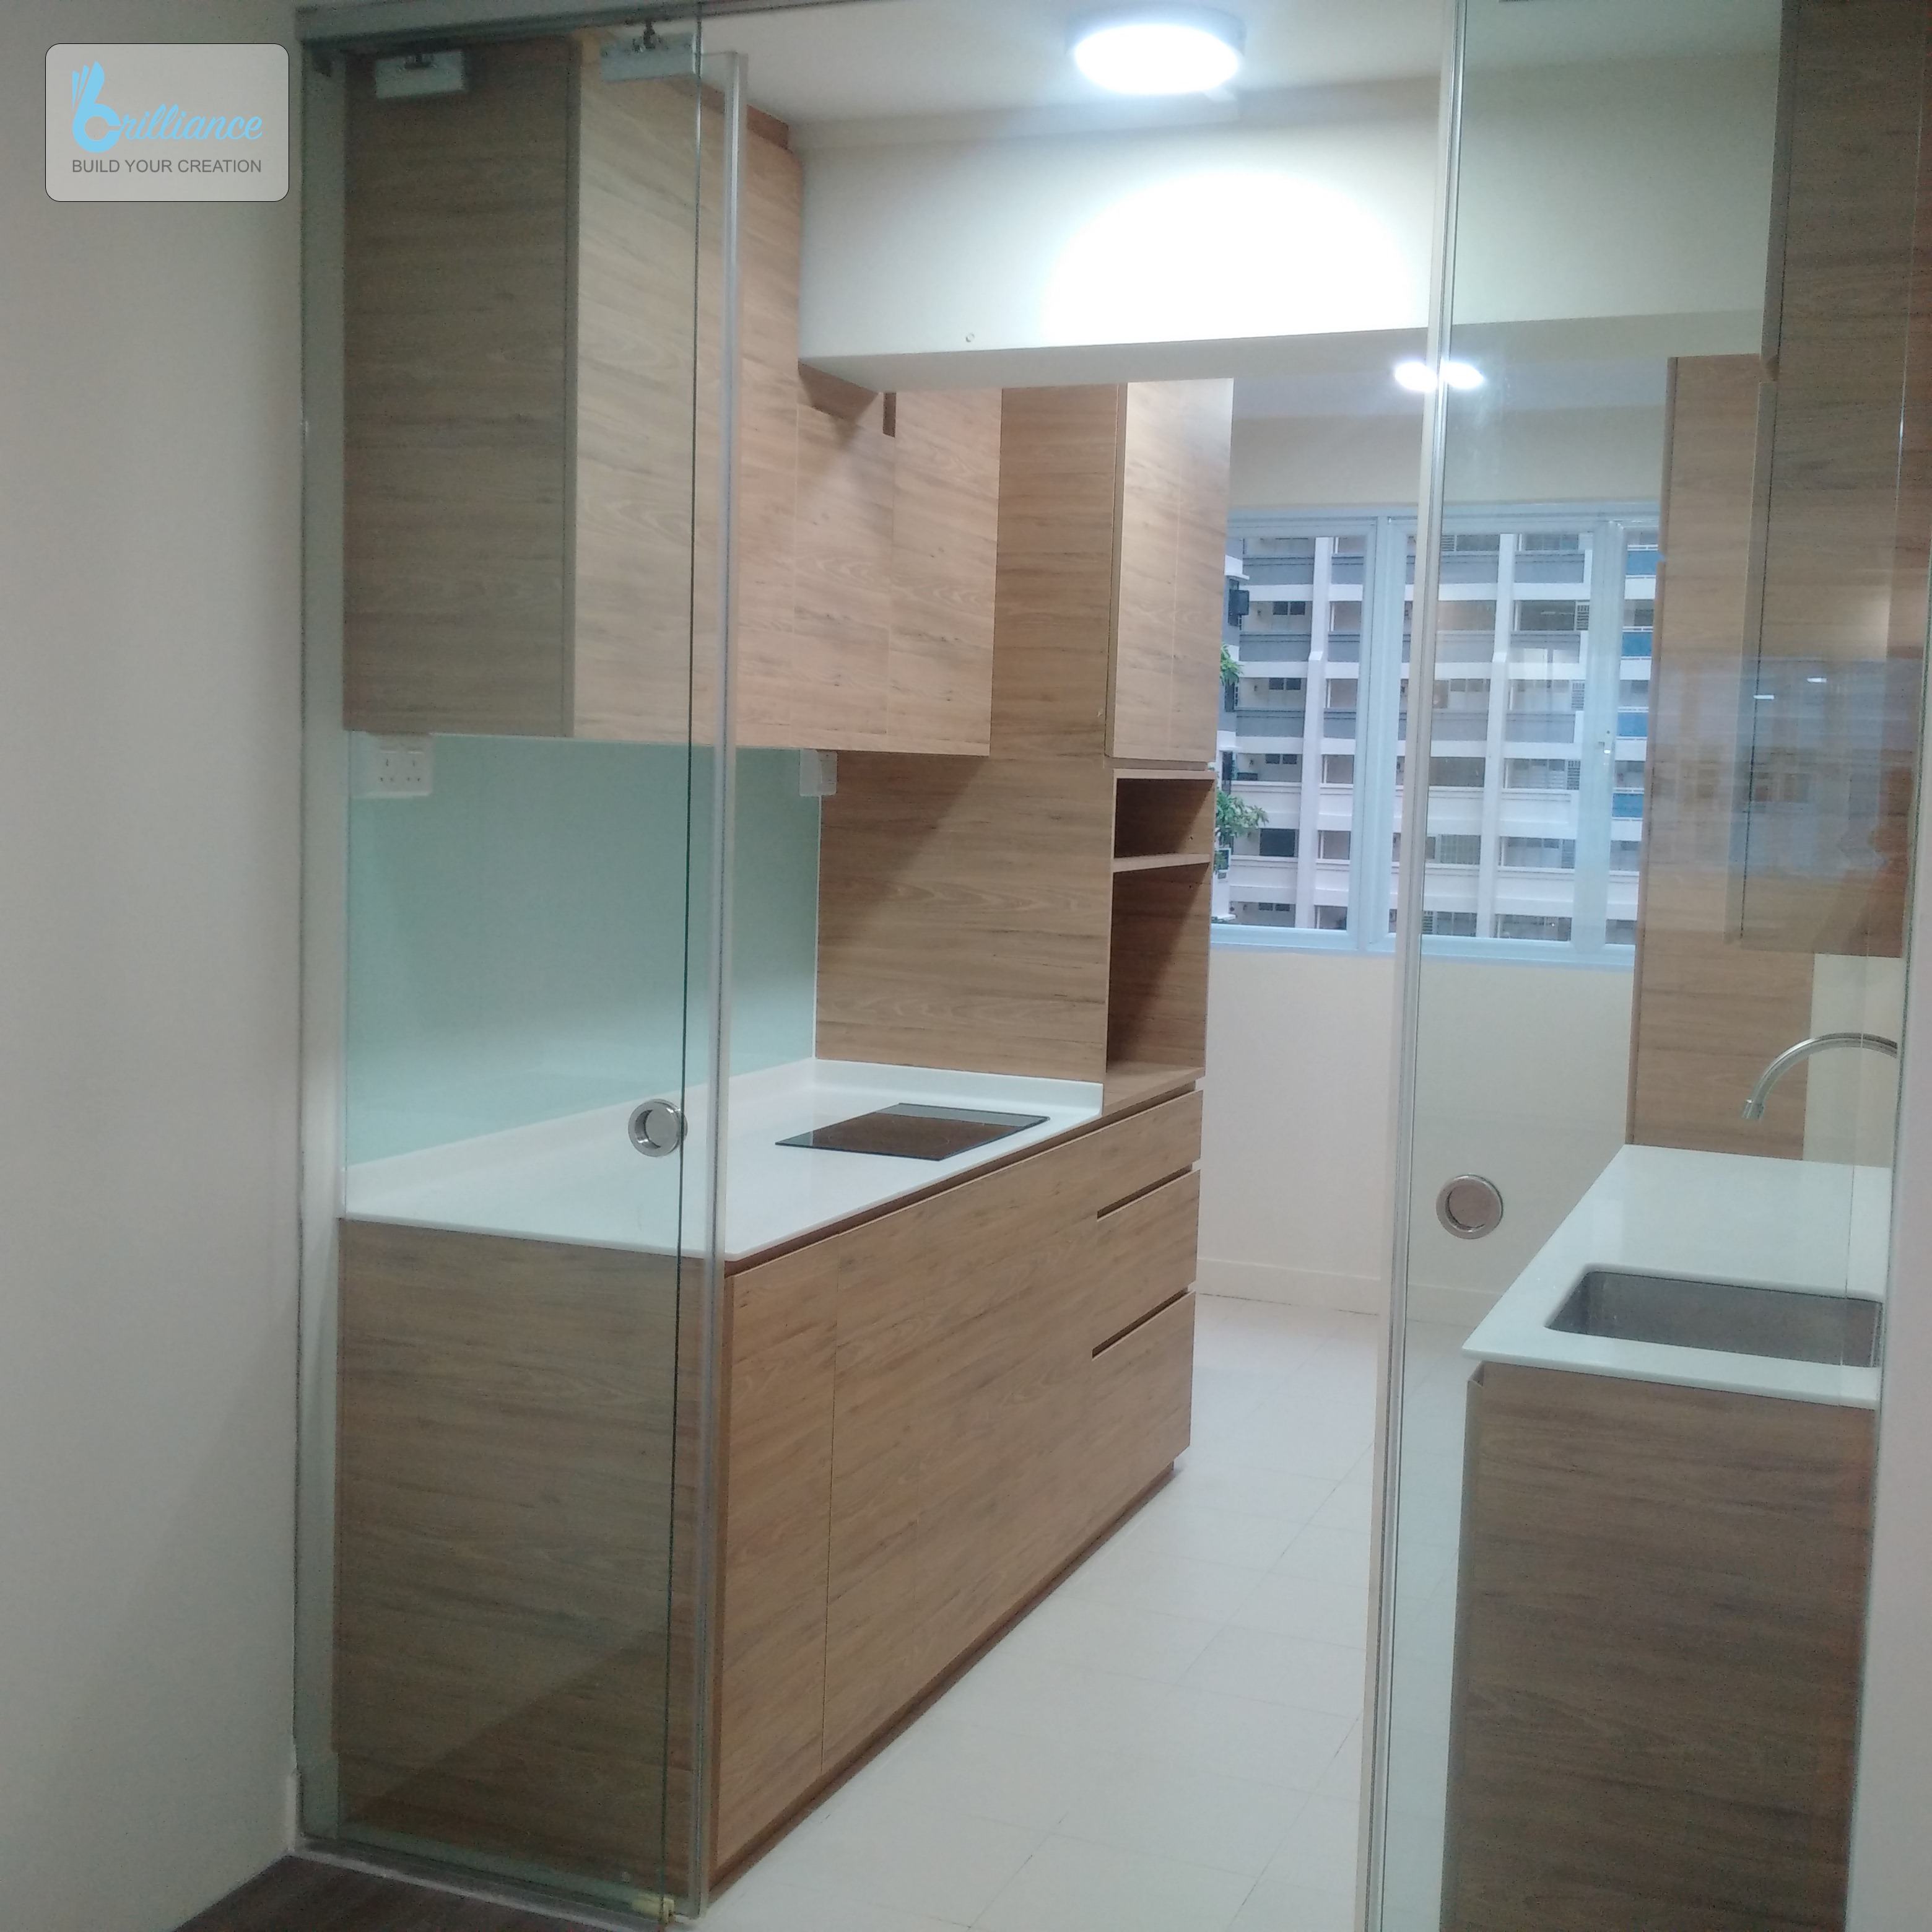 Holland close renovation by brilliance - kitchen